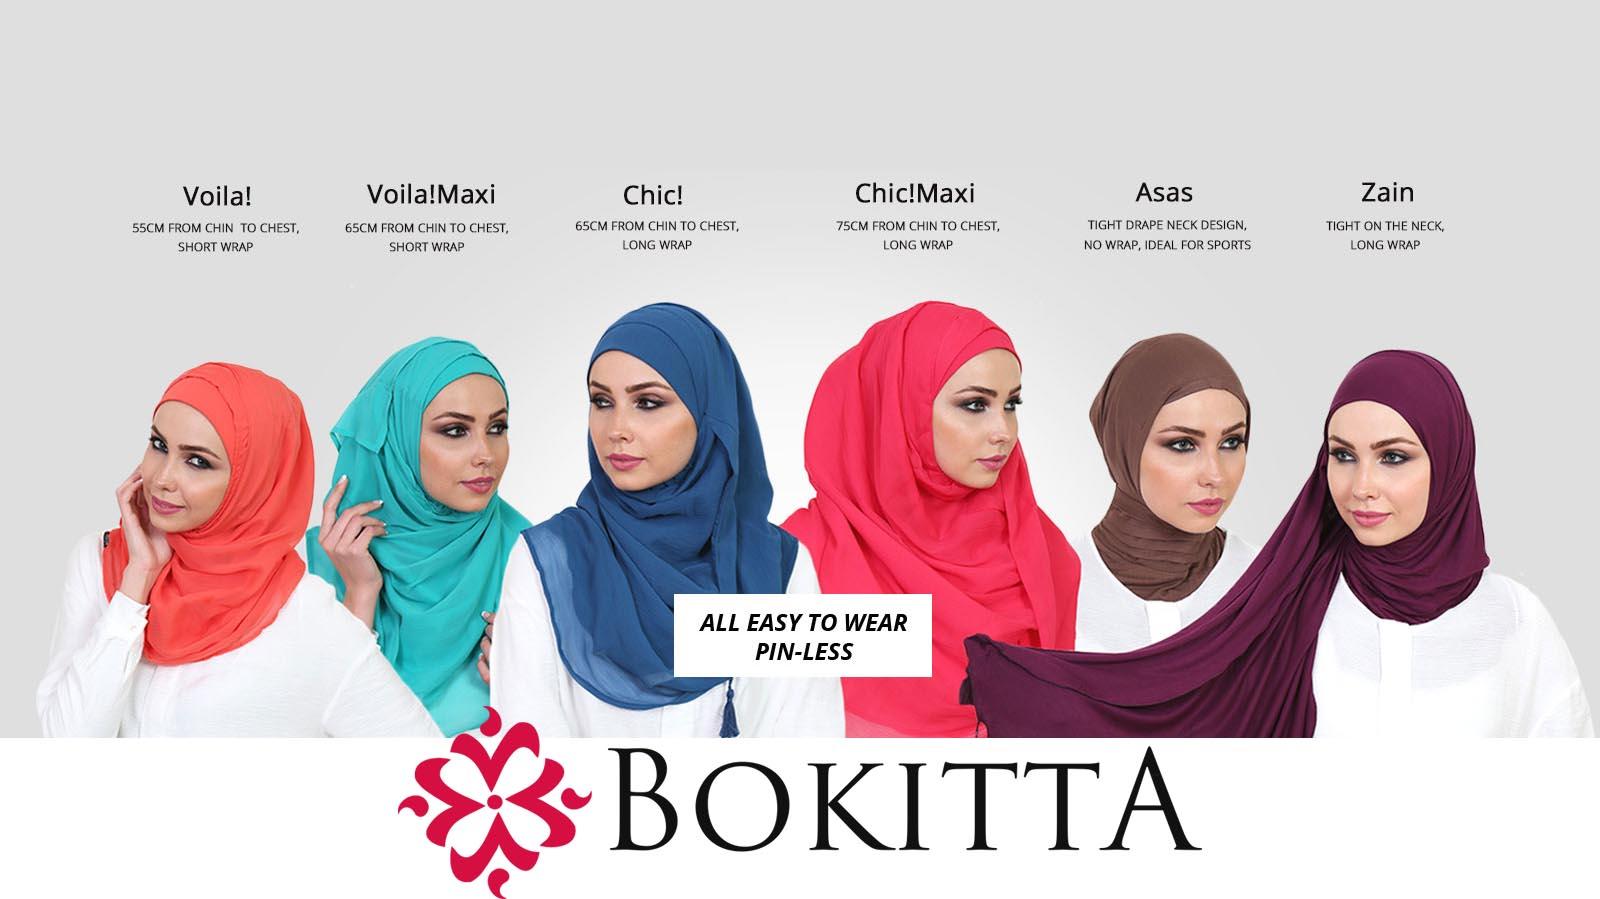 بوکیتا